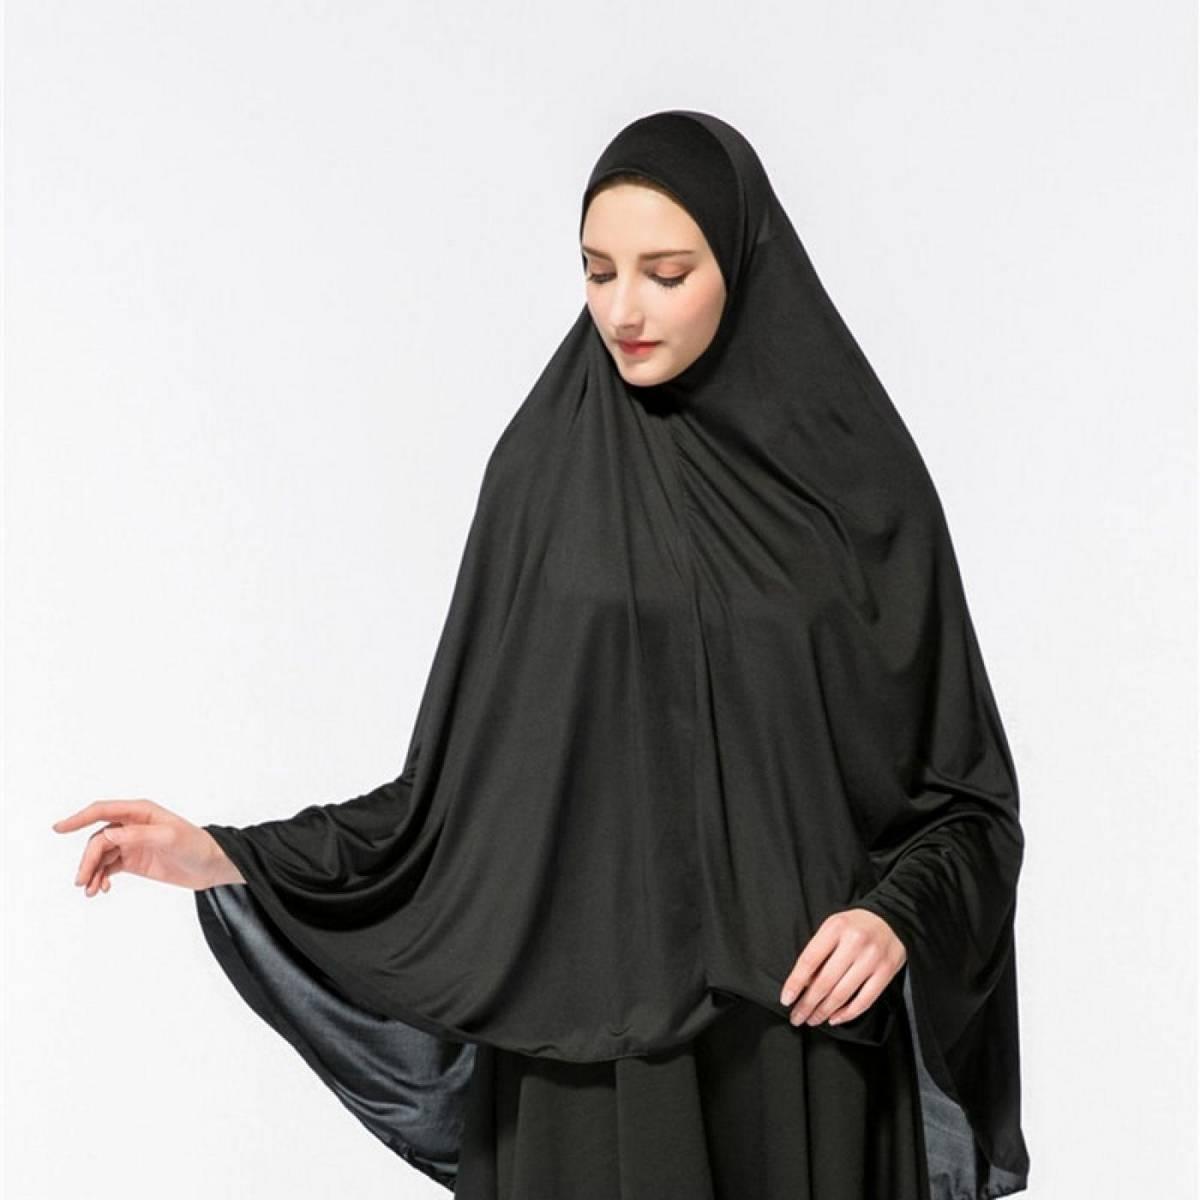 Namaz Hijab With Sleeve High Quality Muslim Women's Hijab scarf Islamic worship Wrap women Head Scarf/scarves Milk silk Elastic Solid Black Color Turban